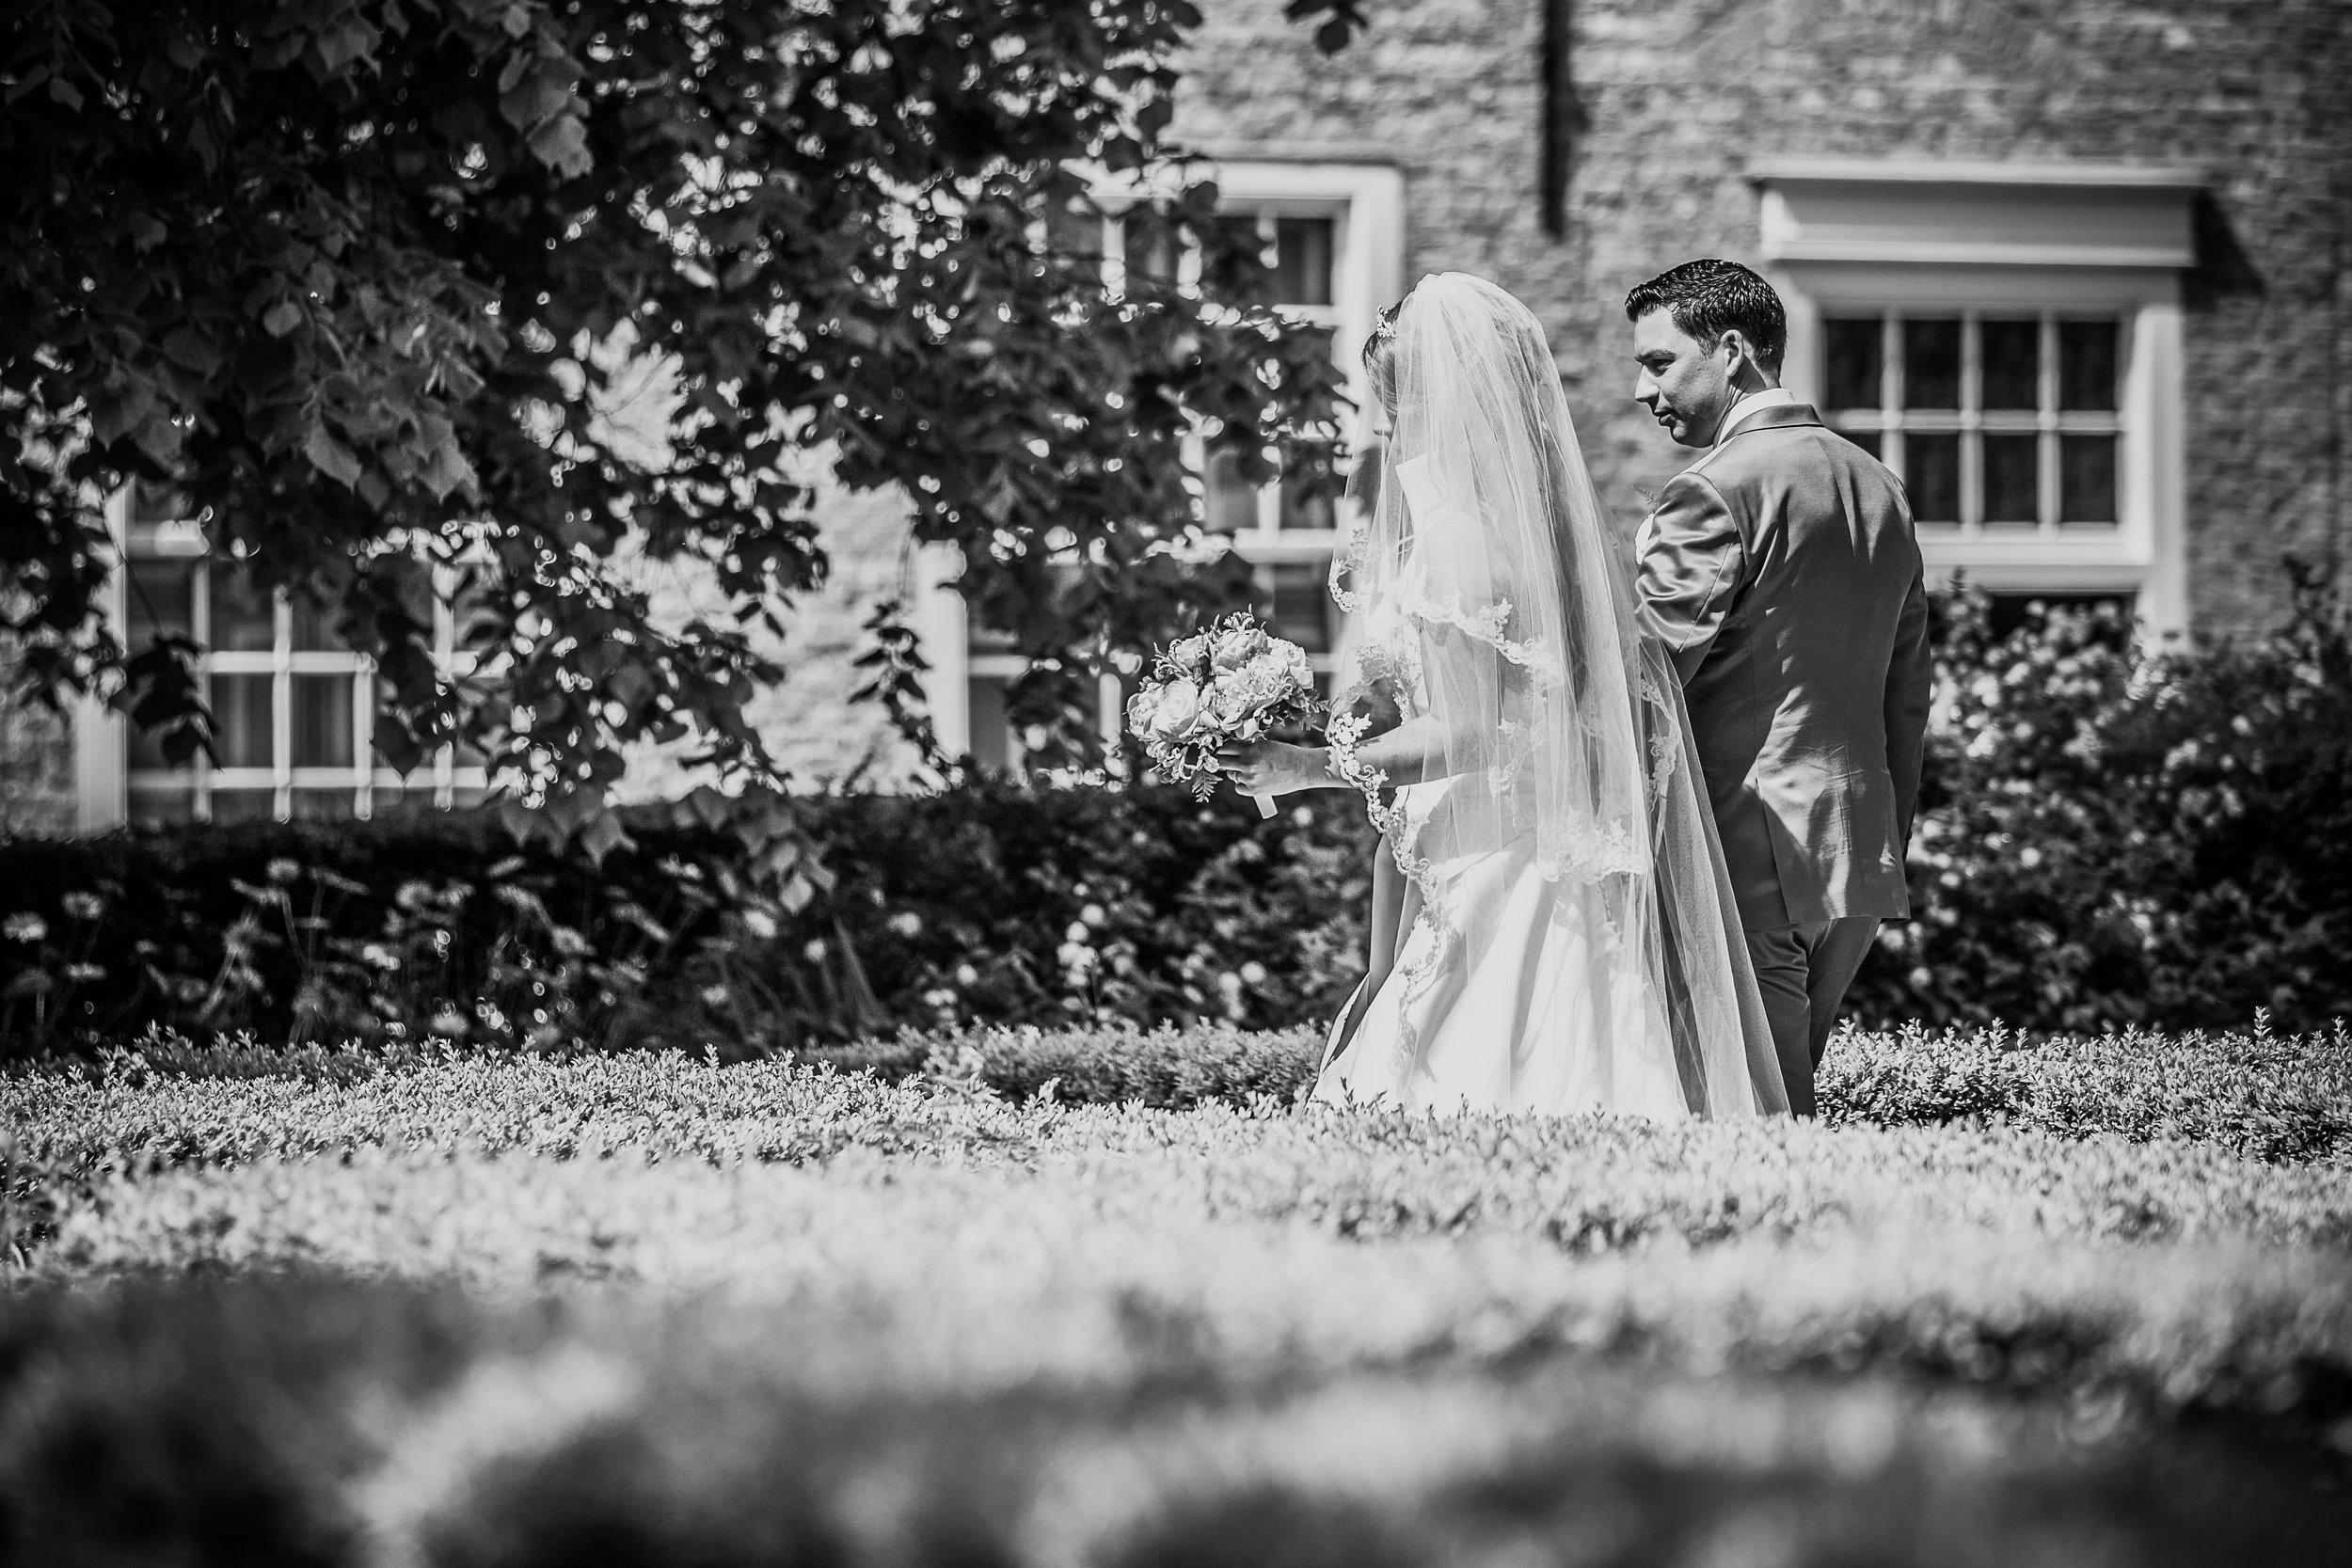 bruidsfotografie-trouwreportage-huwelijksfotografie-bruidsfotograaf-feestfotografie-Anouk en Edgar-72.jpg